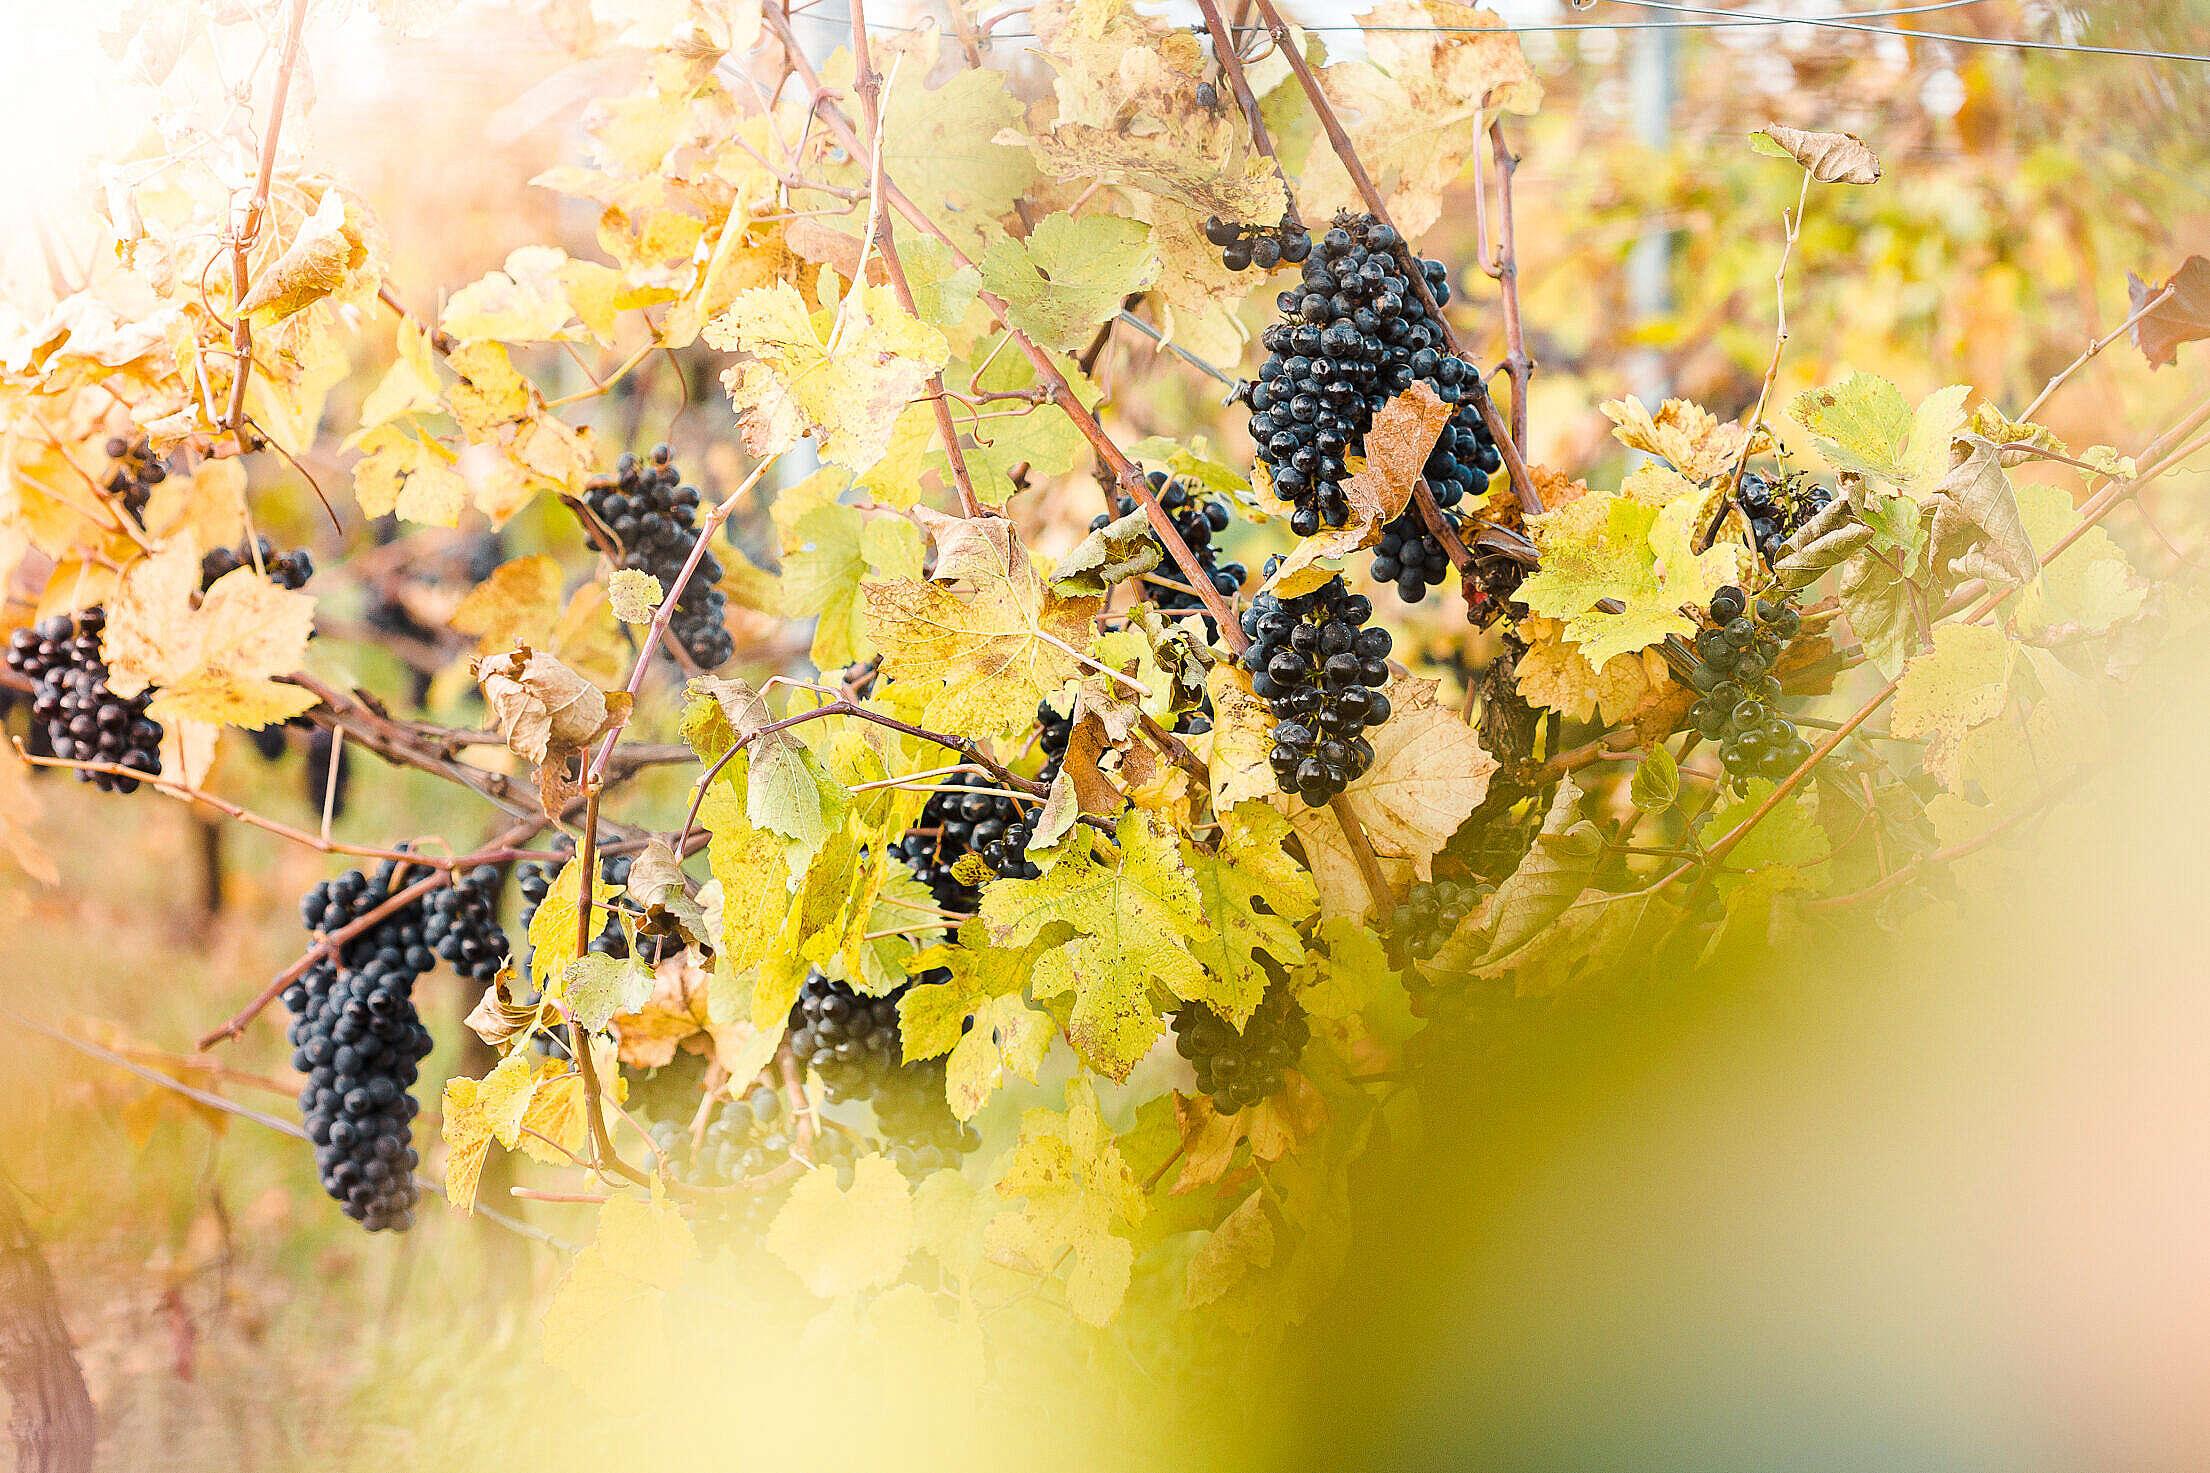 Vineyard Full of Blue Grapes Free Stock Photo